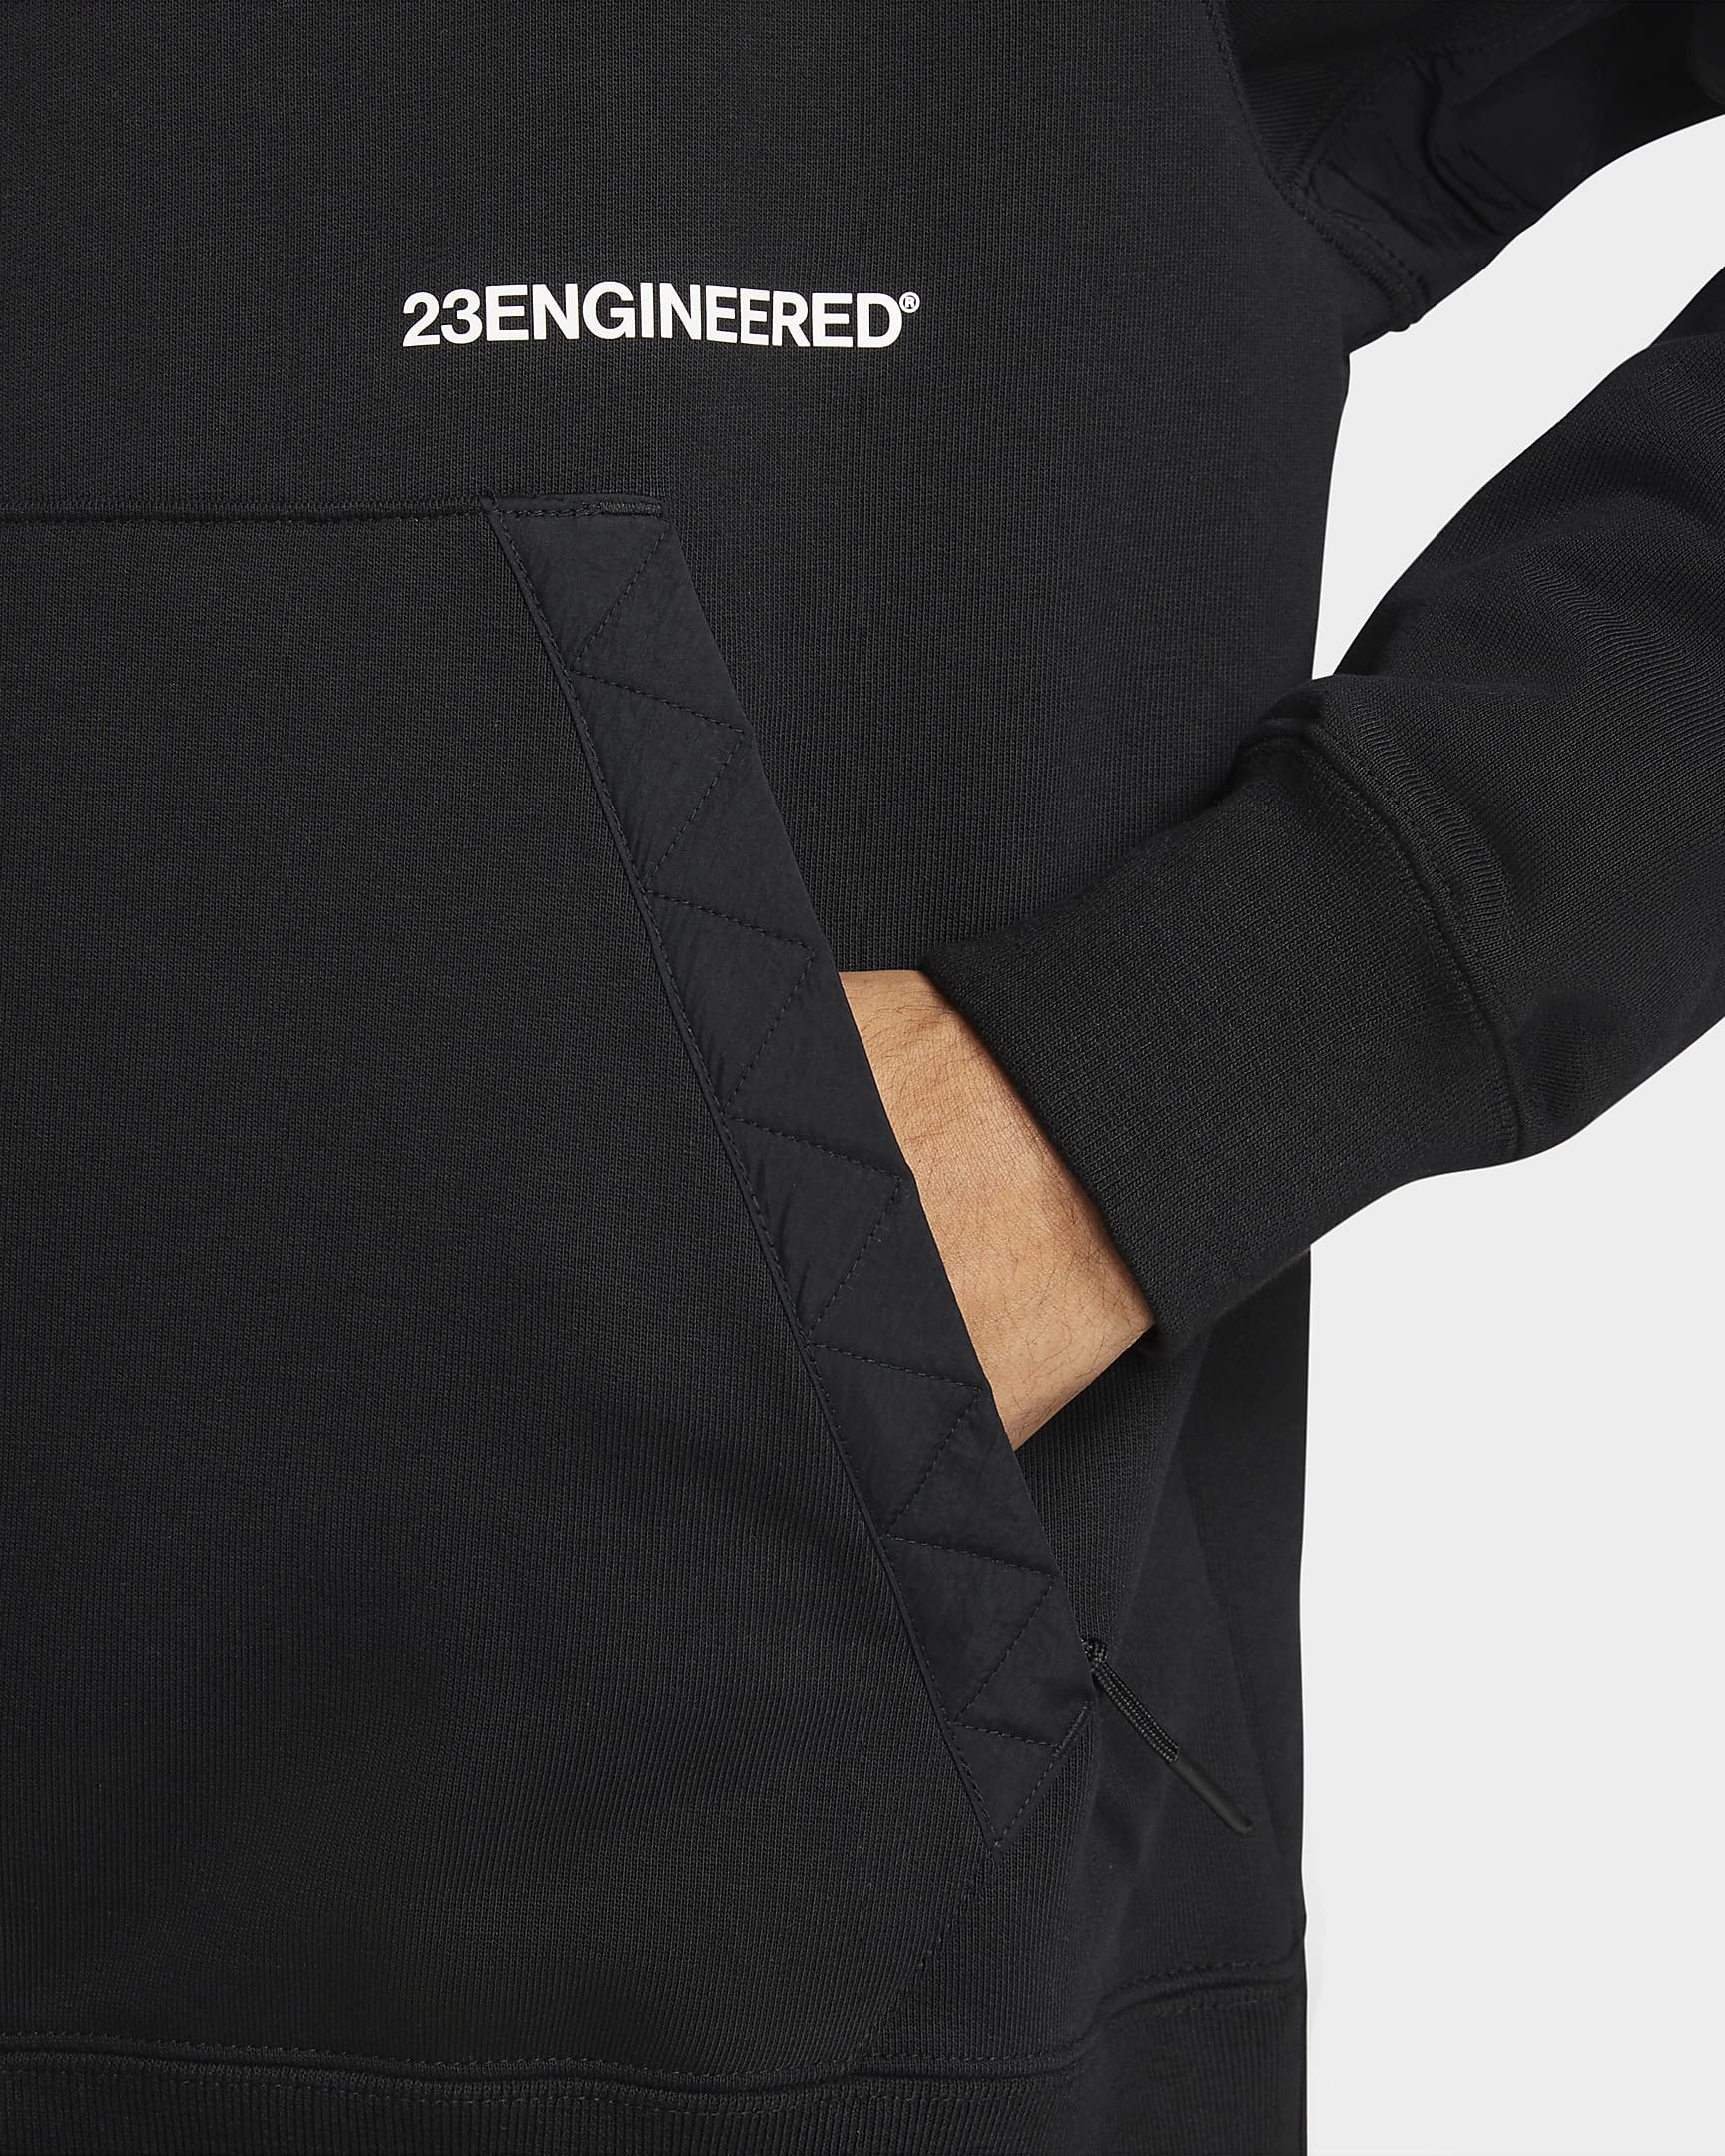 jordan-23-engineered-mens-fleece-pullover-hoodie-QbRhJ5-3.png